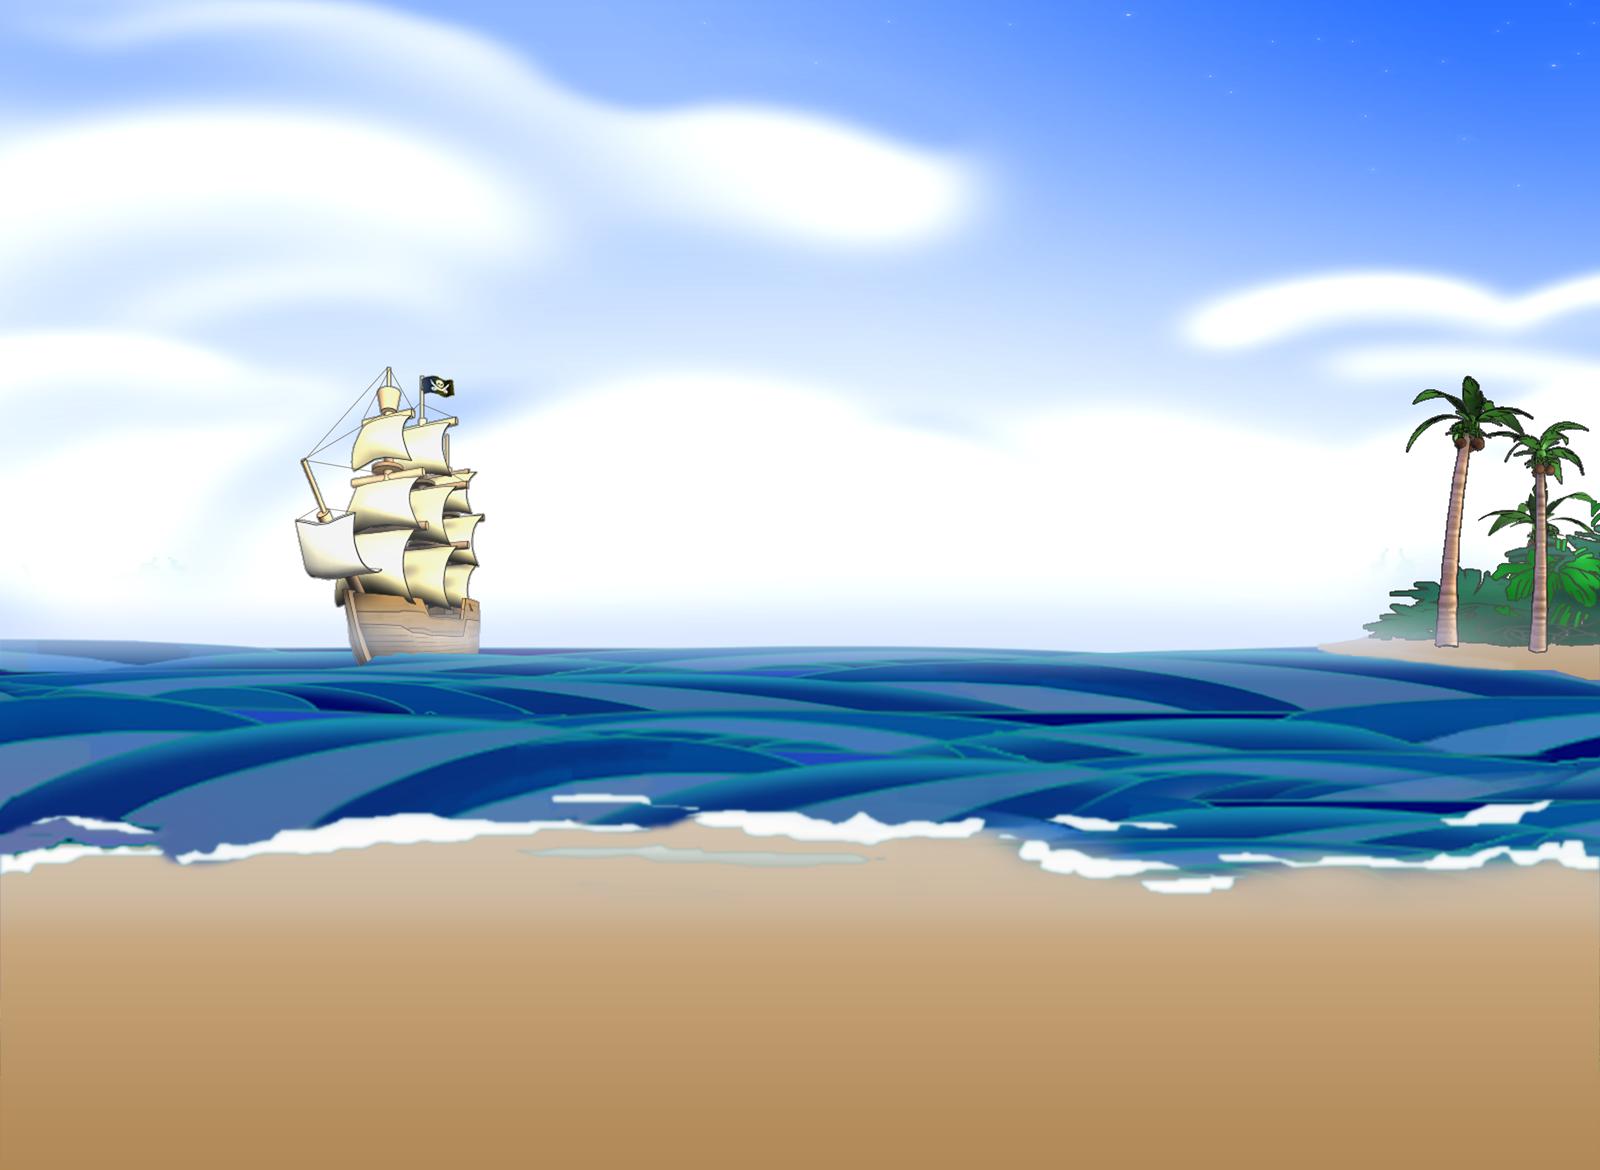 Днем, картинка морской тематики к презентации